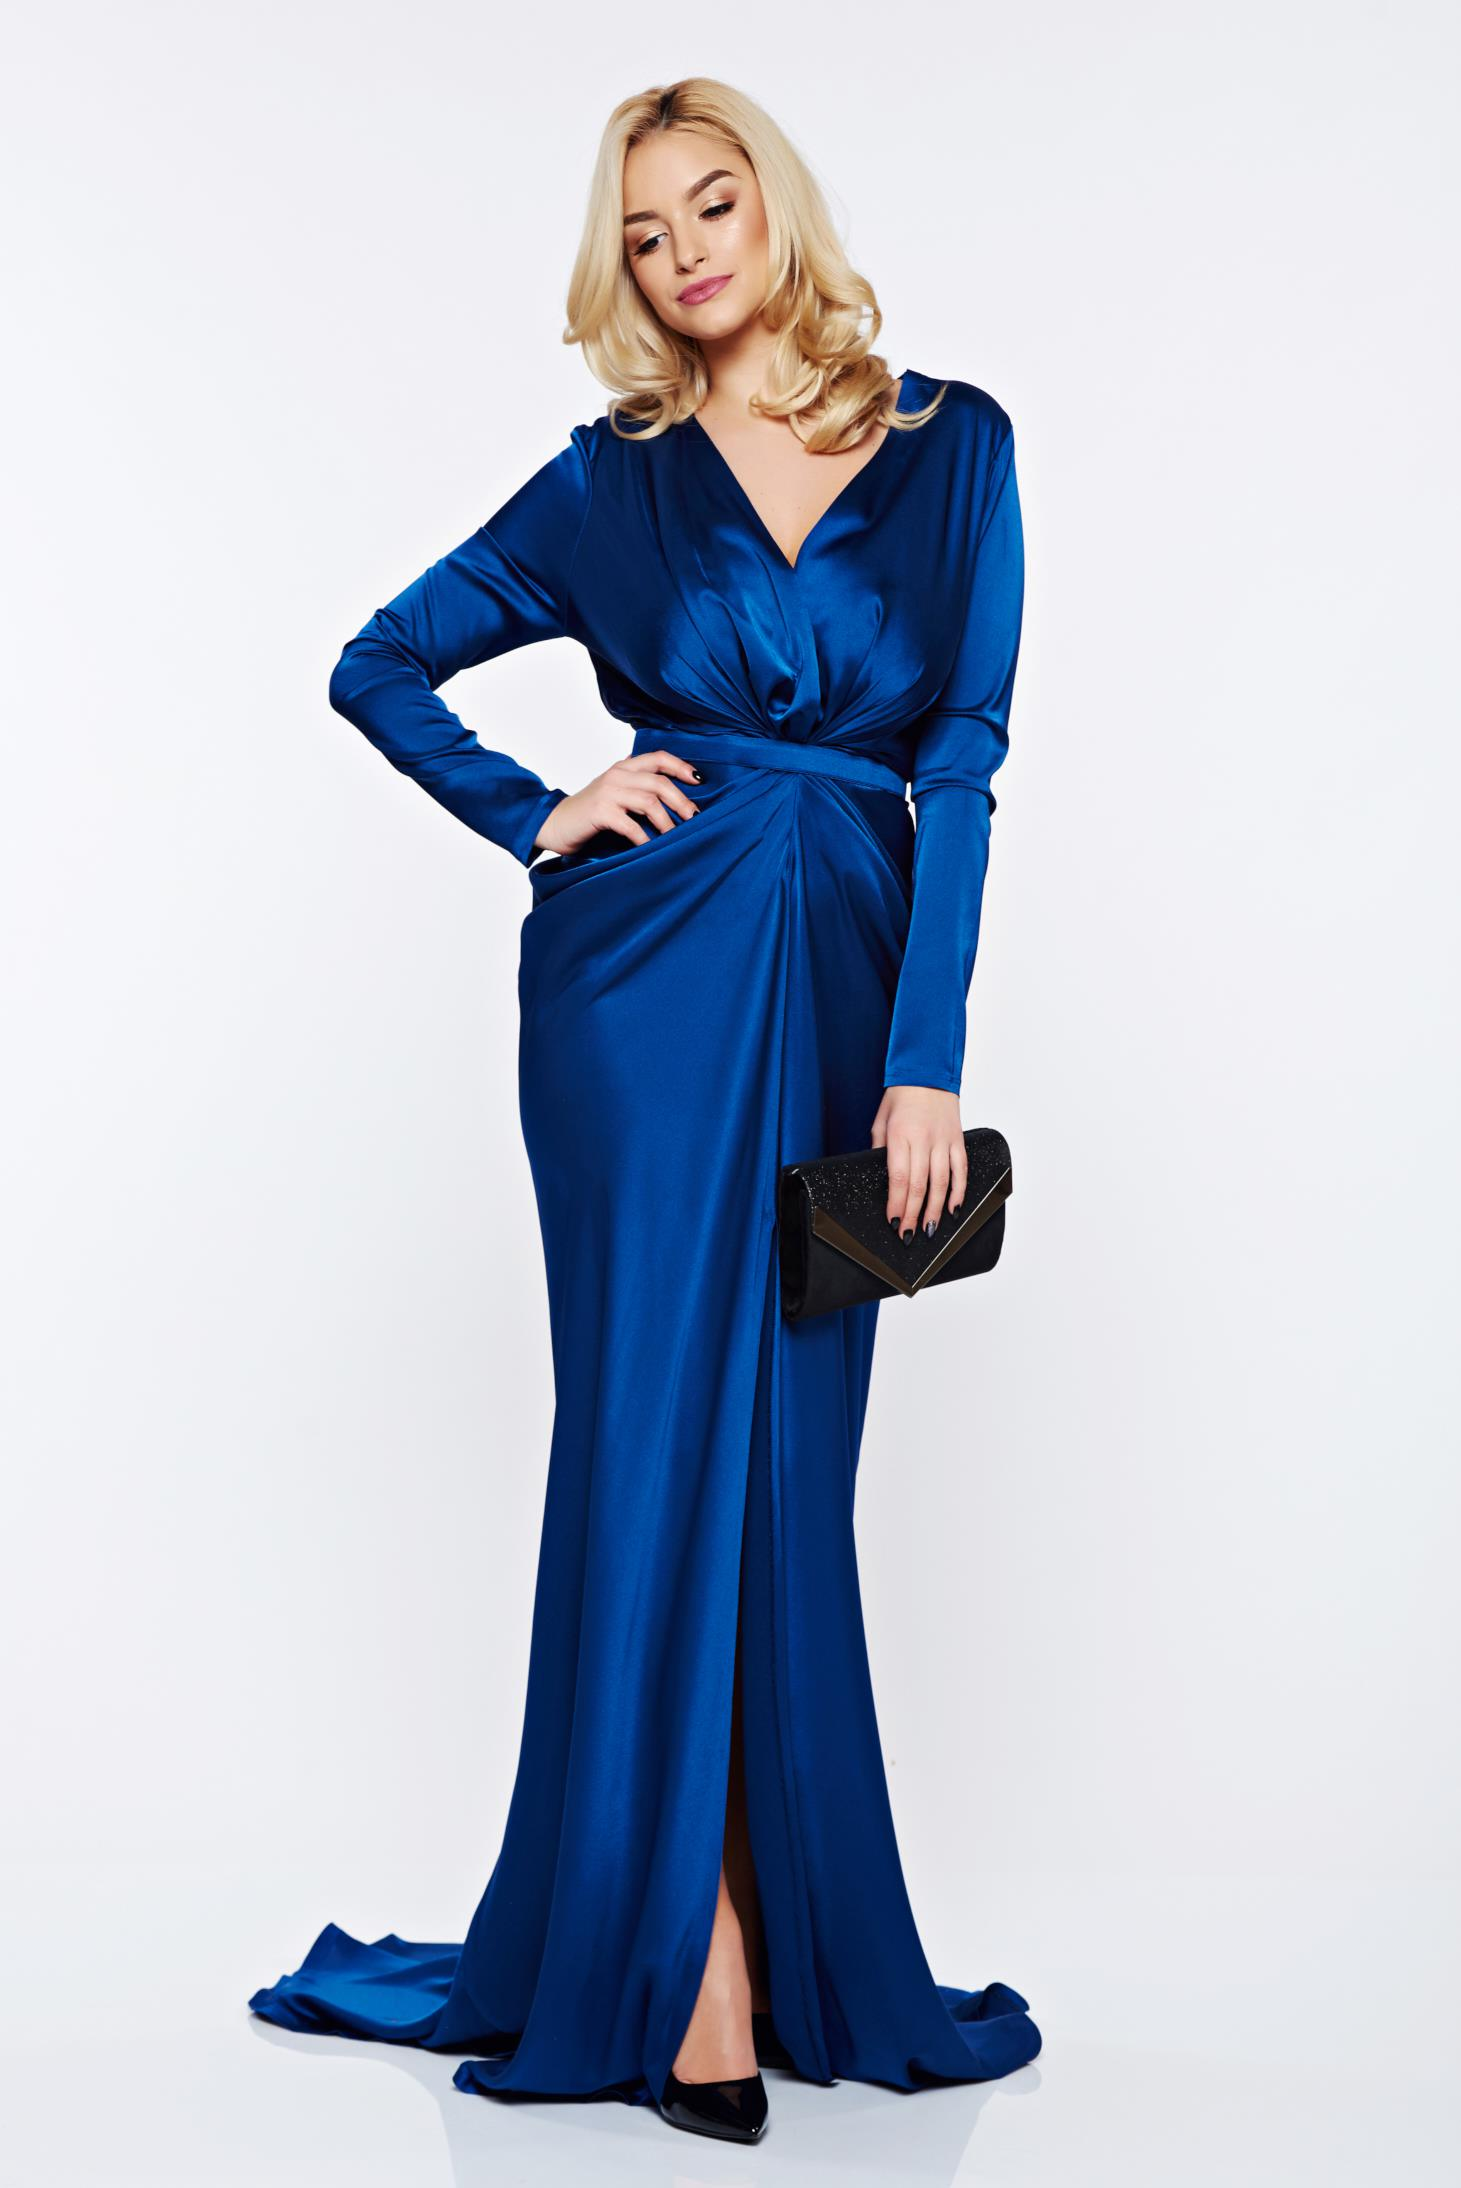 Ana Radu darkblue occasional long sleeved dress accessorized with tied waistband